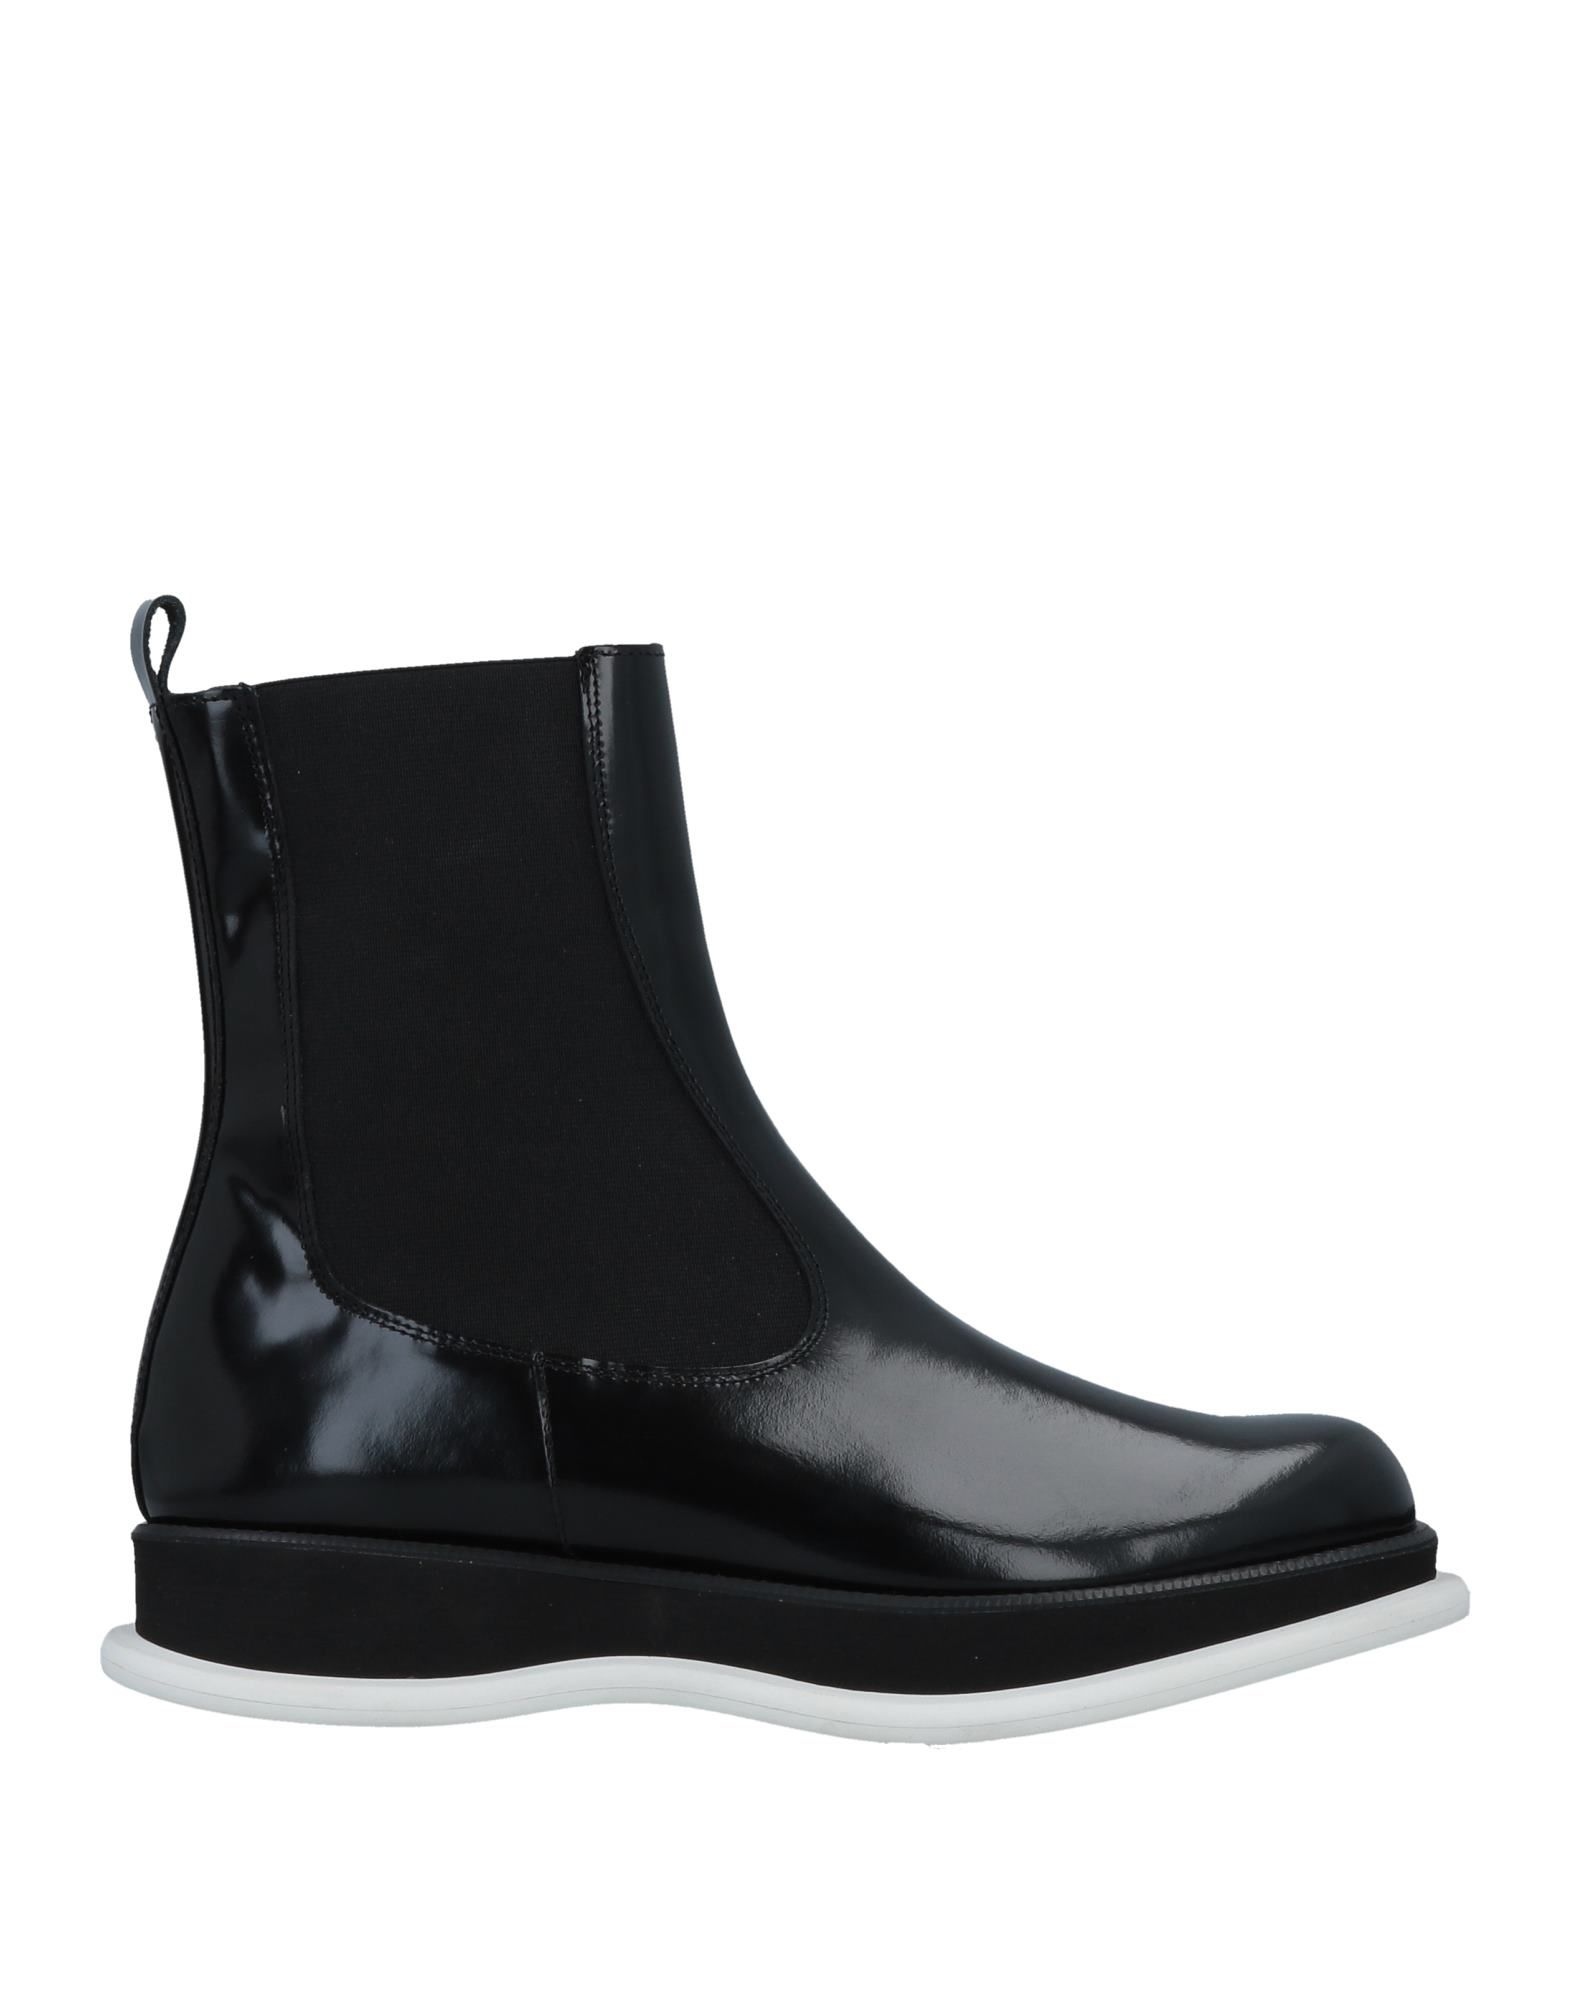 Paloma Barceló Chelsea Boots 11509365DB Damen  11509365DB Boots Neue Schuhe 67bdd7